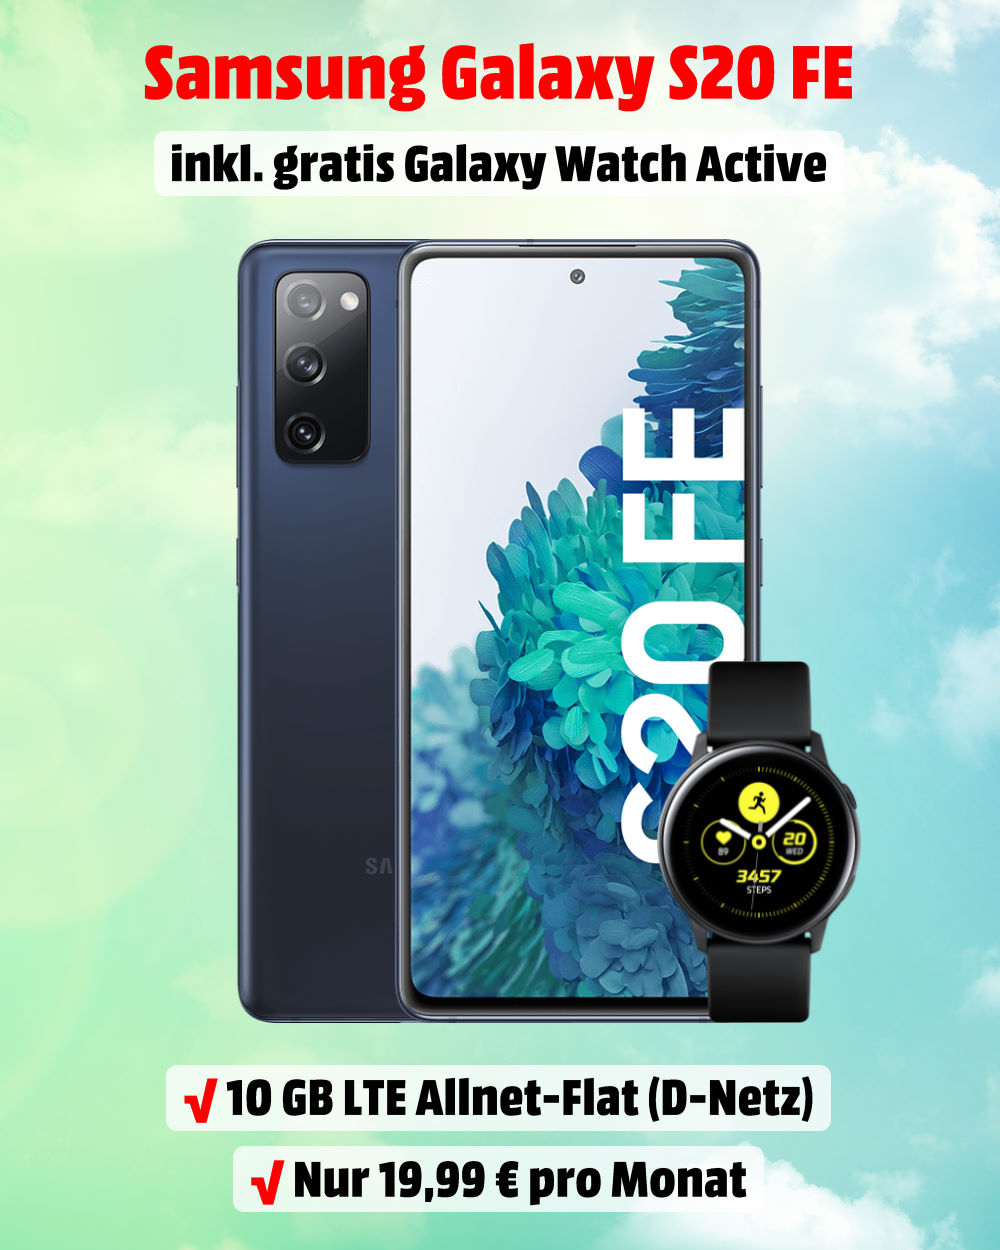 Galaxy S20 FE inkl. Galaxy Watch Active und 10 GB LTE Allnet-Flat - Handy-Tarifvergleich